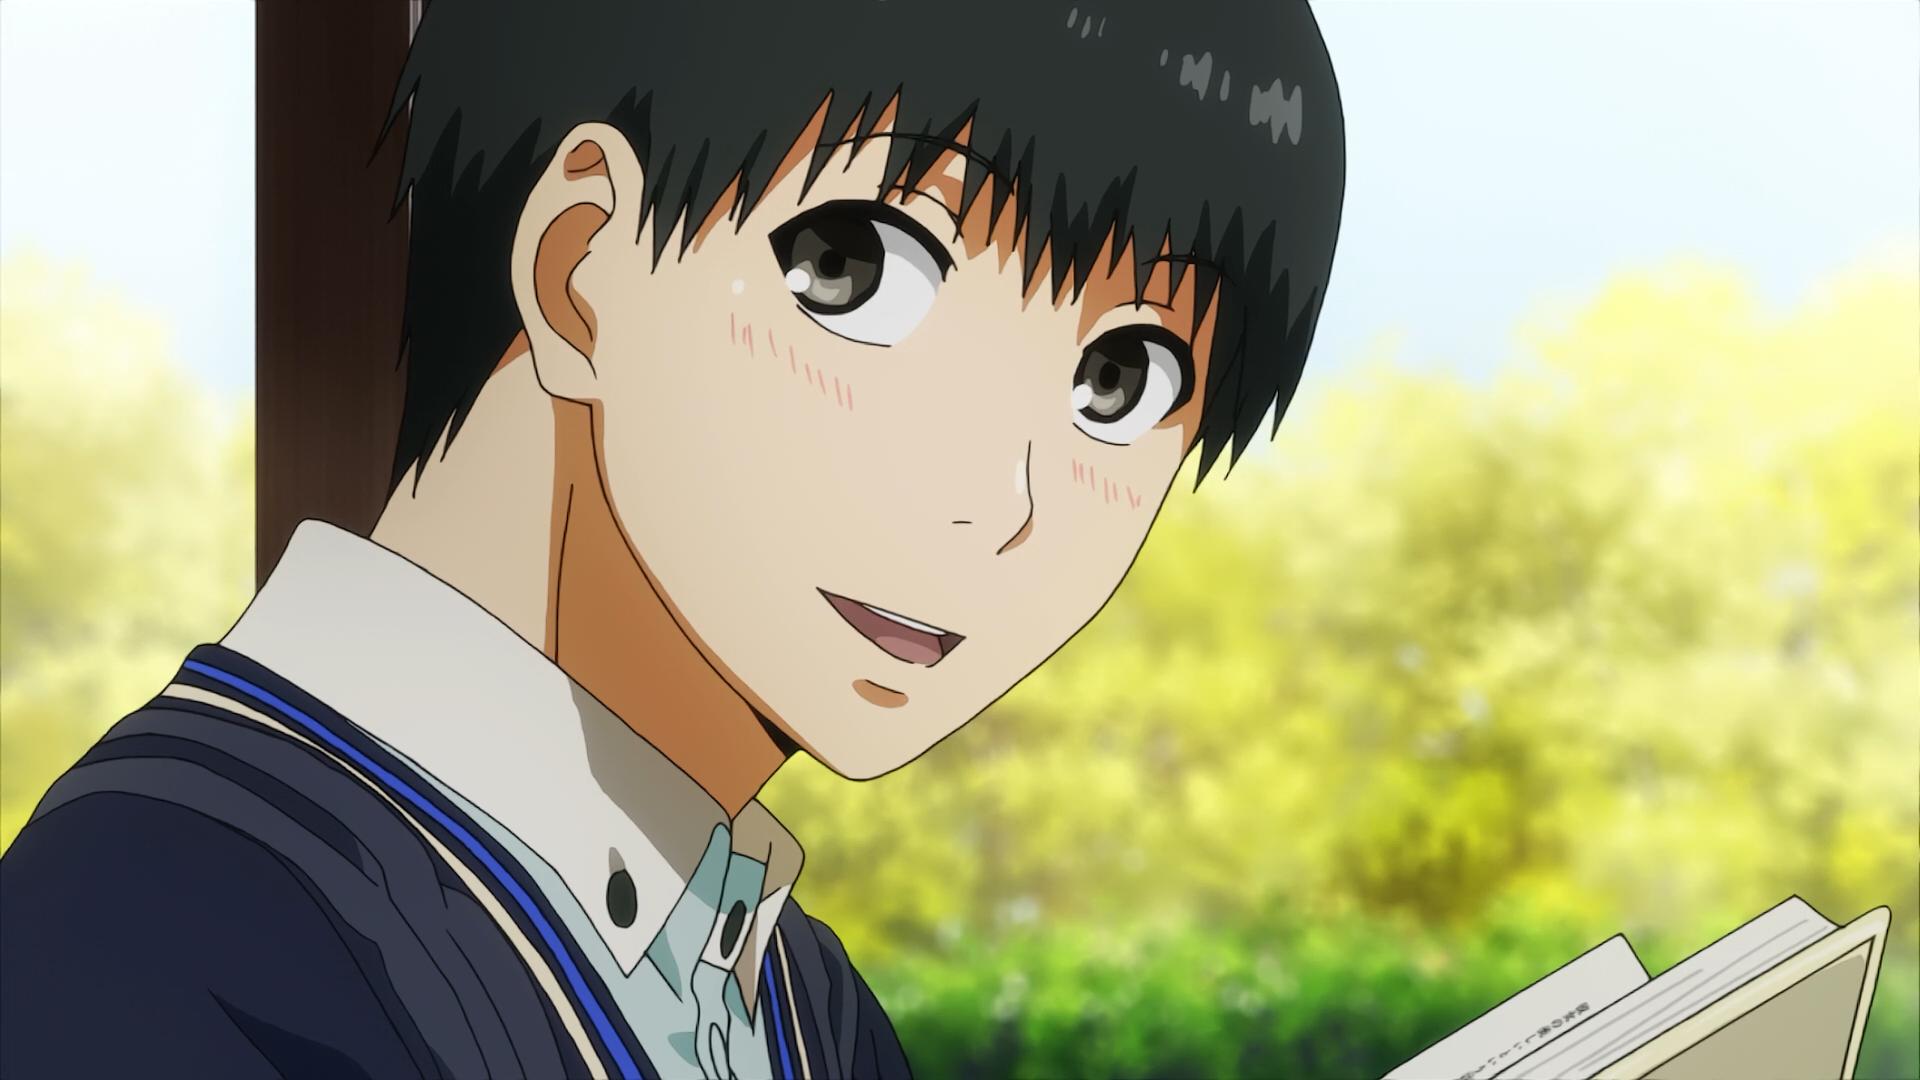 Kaneki noticing that Rize reads the same novel